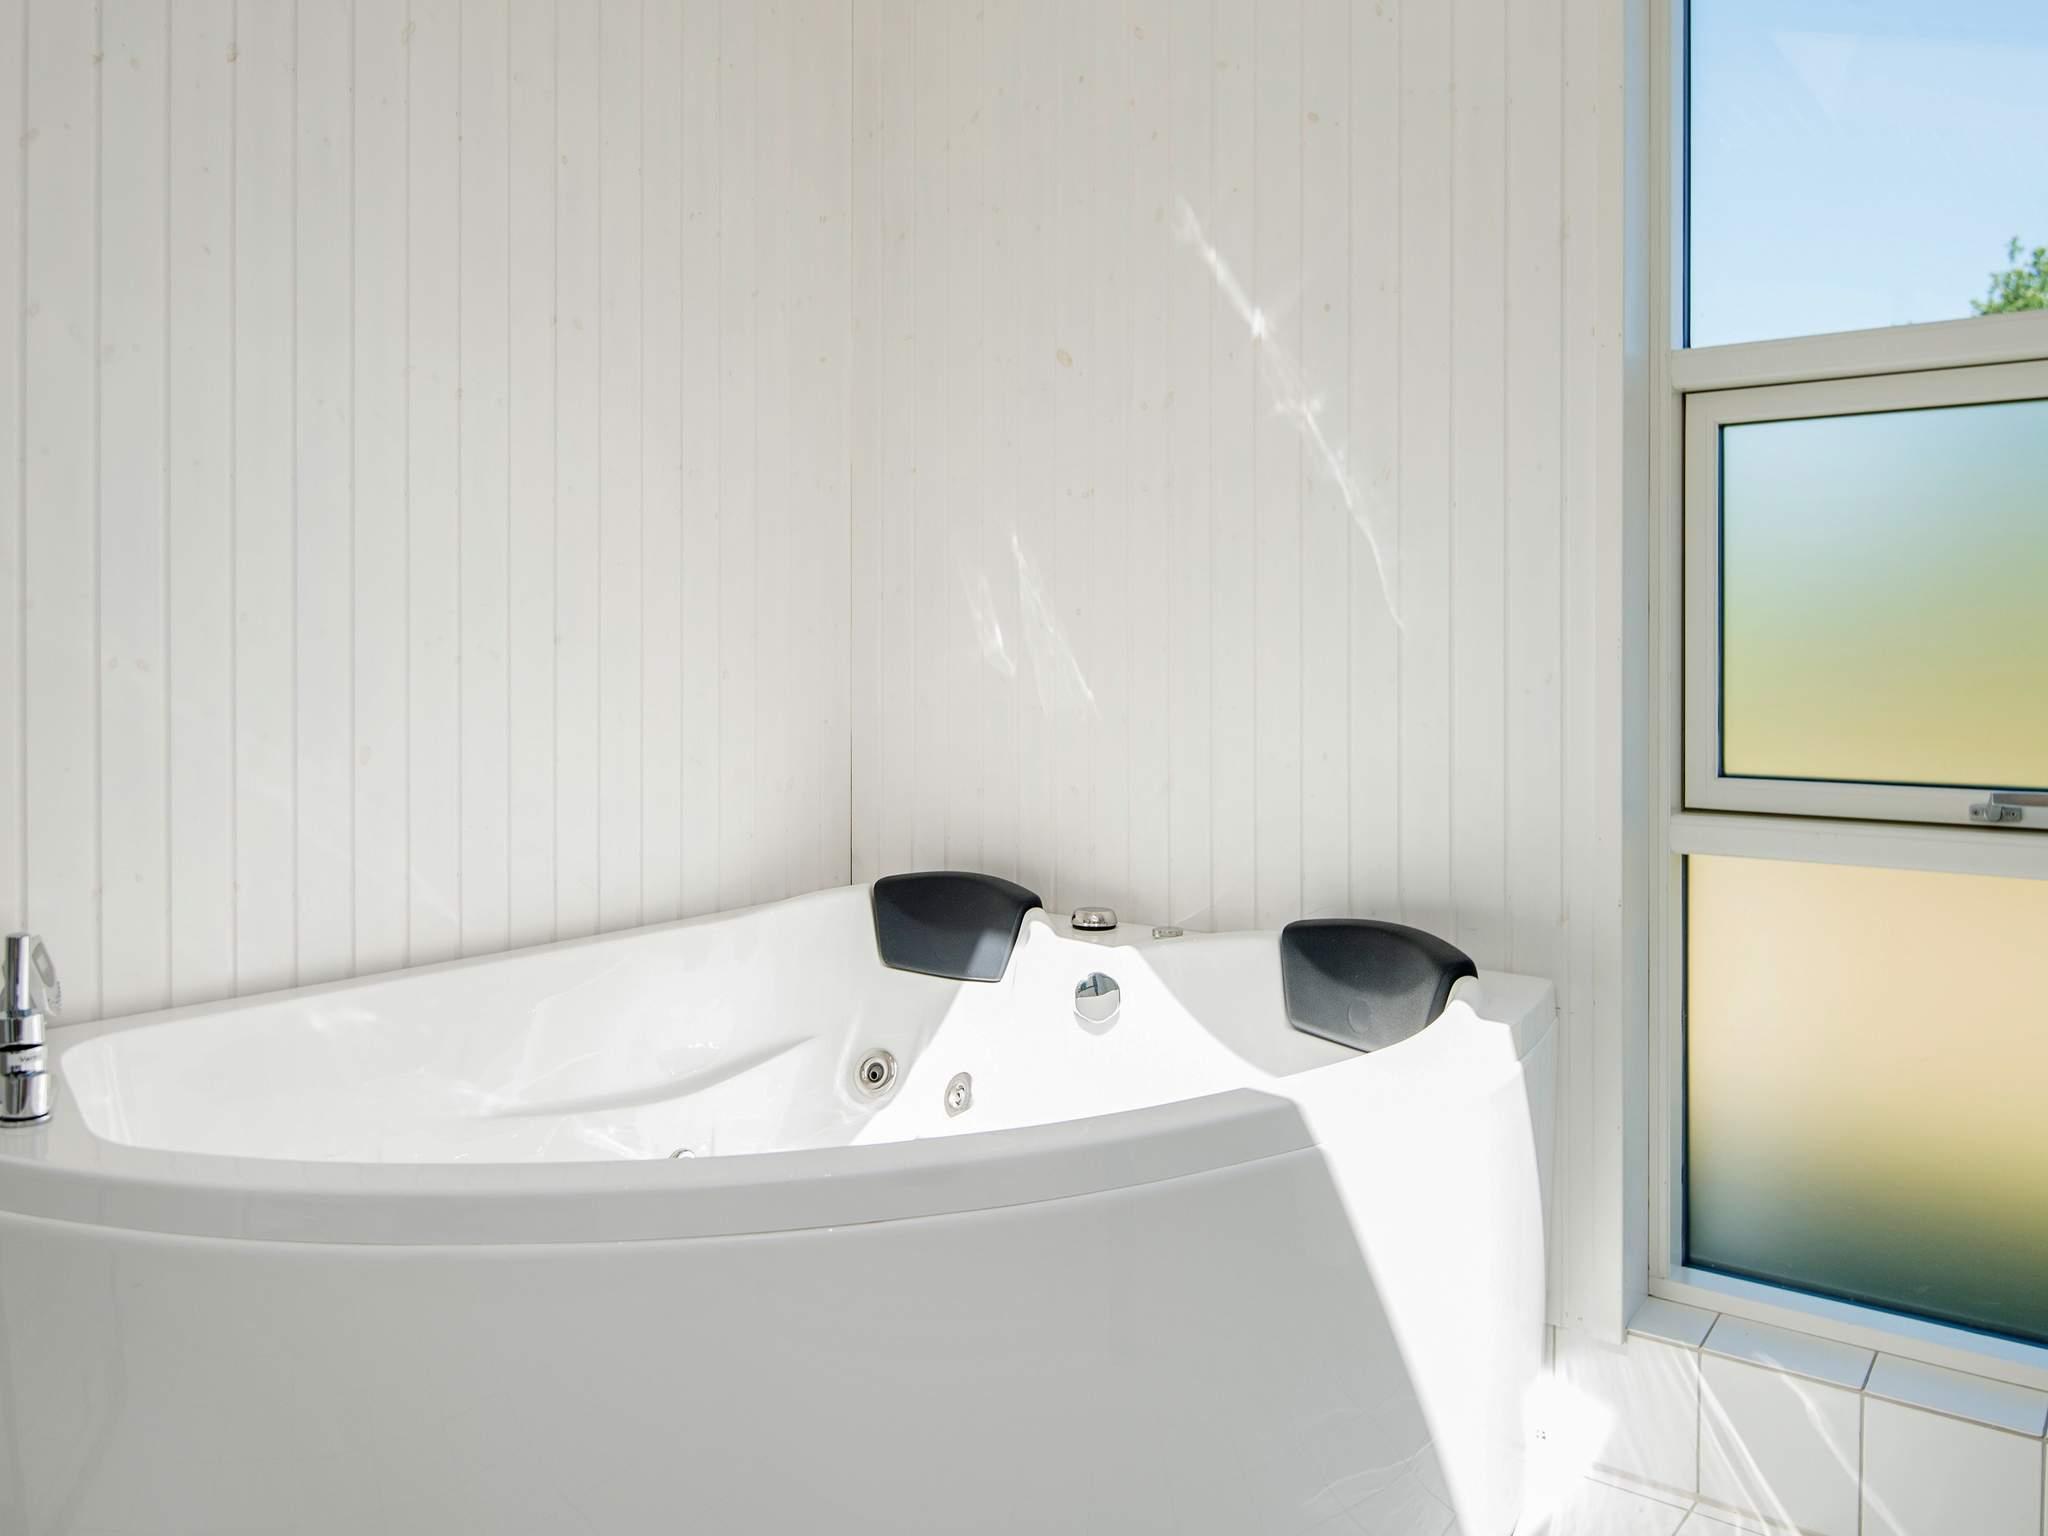 Maison de vacances Helgenæs (978615), Knebel, , Jutland Est, Danemark, image 14